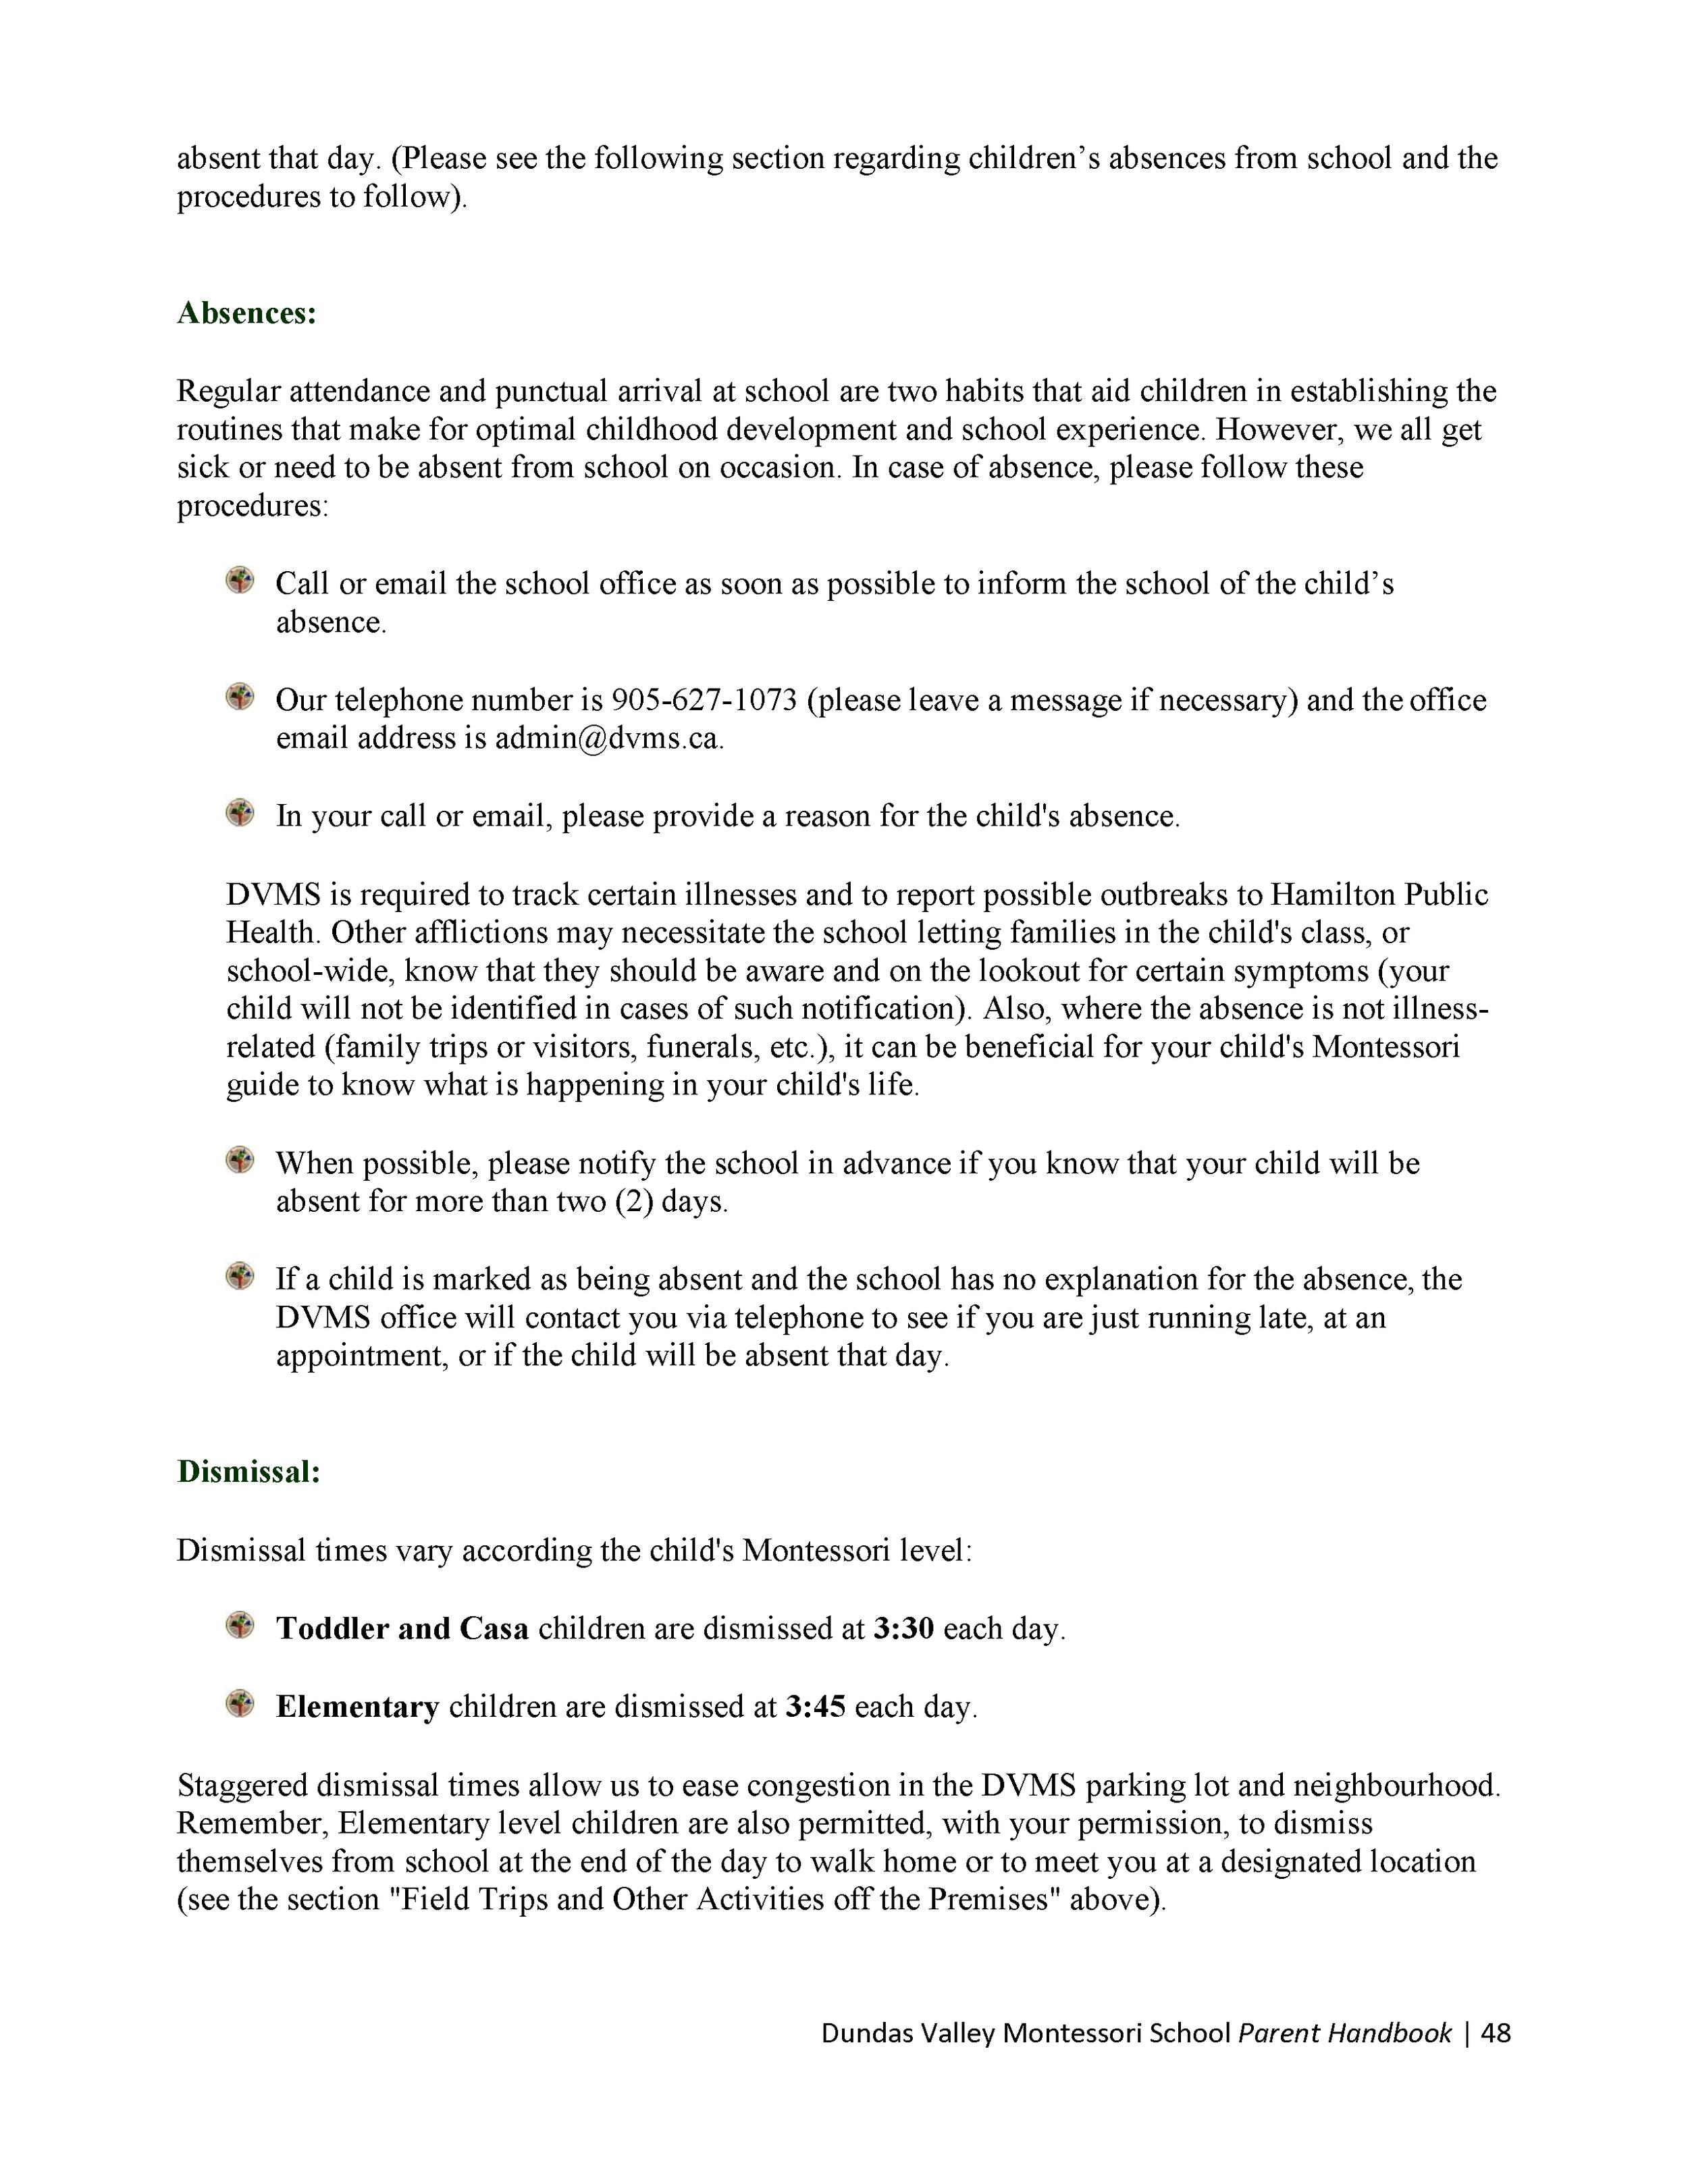 DVMS-Parent-Handbook-19-20_Page_050.png